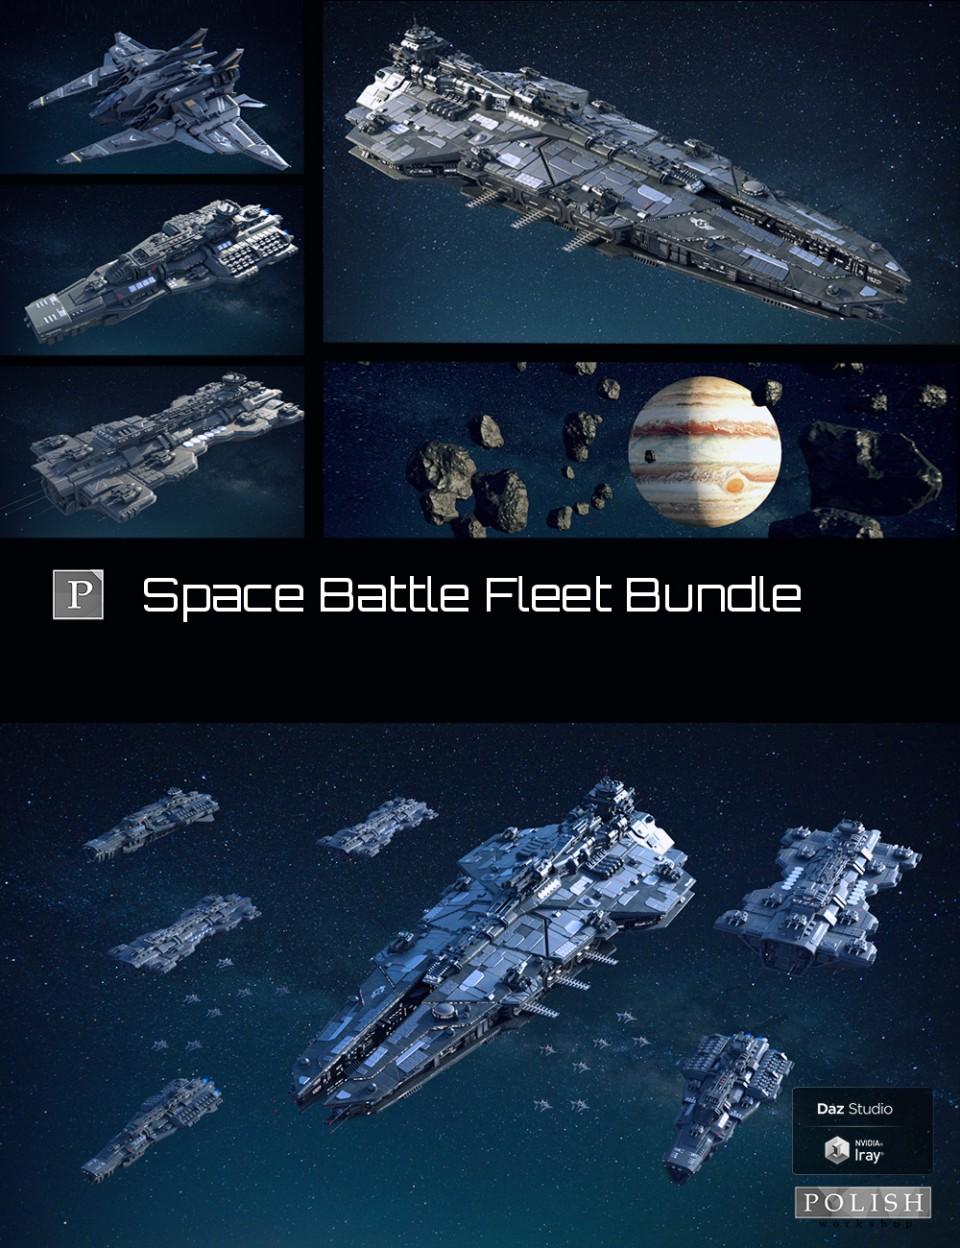 Space Battle Fleet Bundle